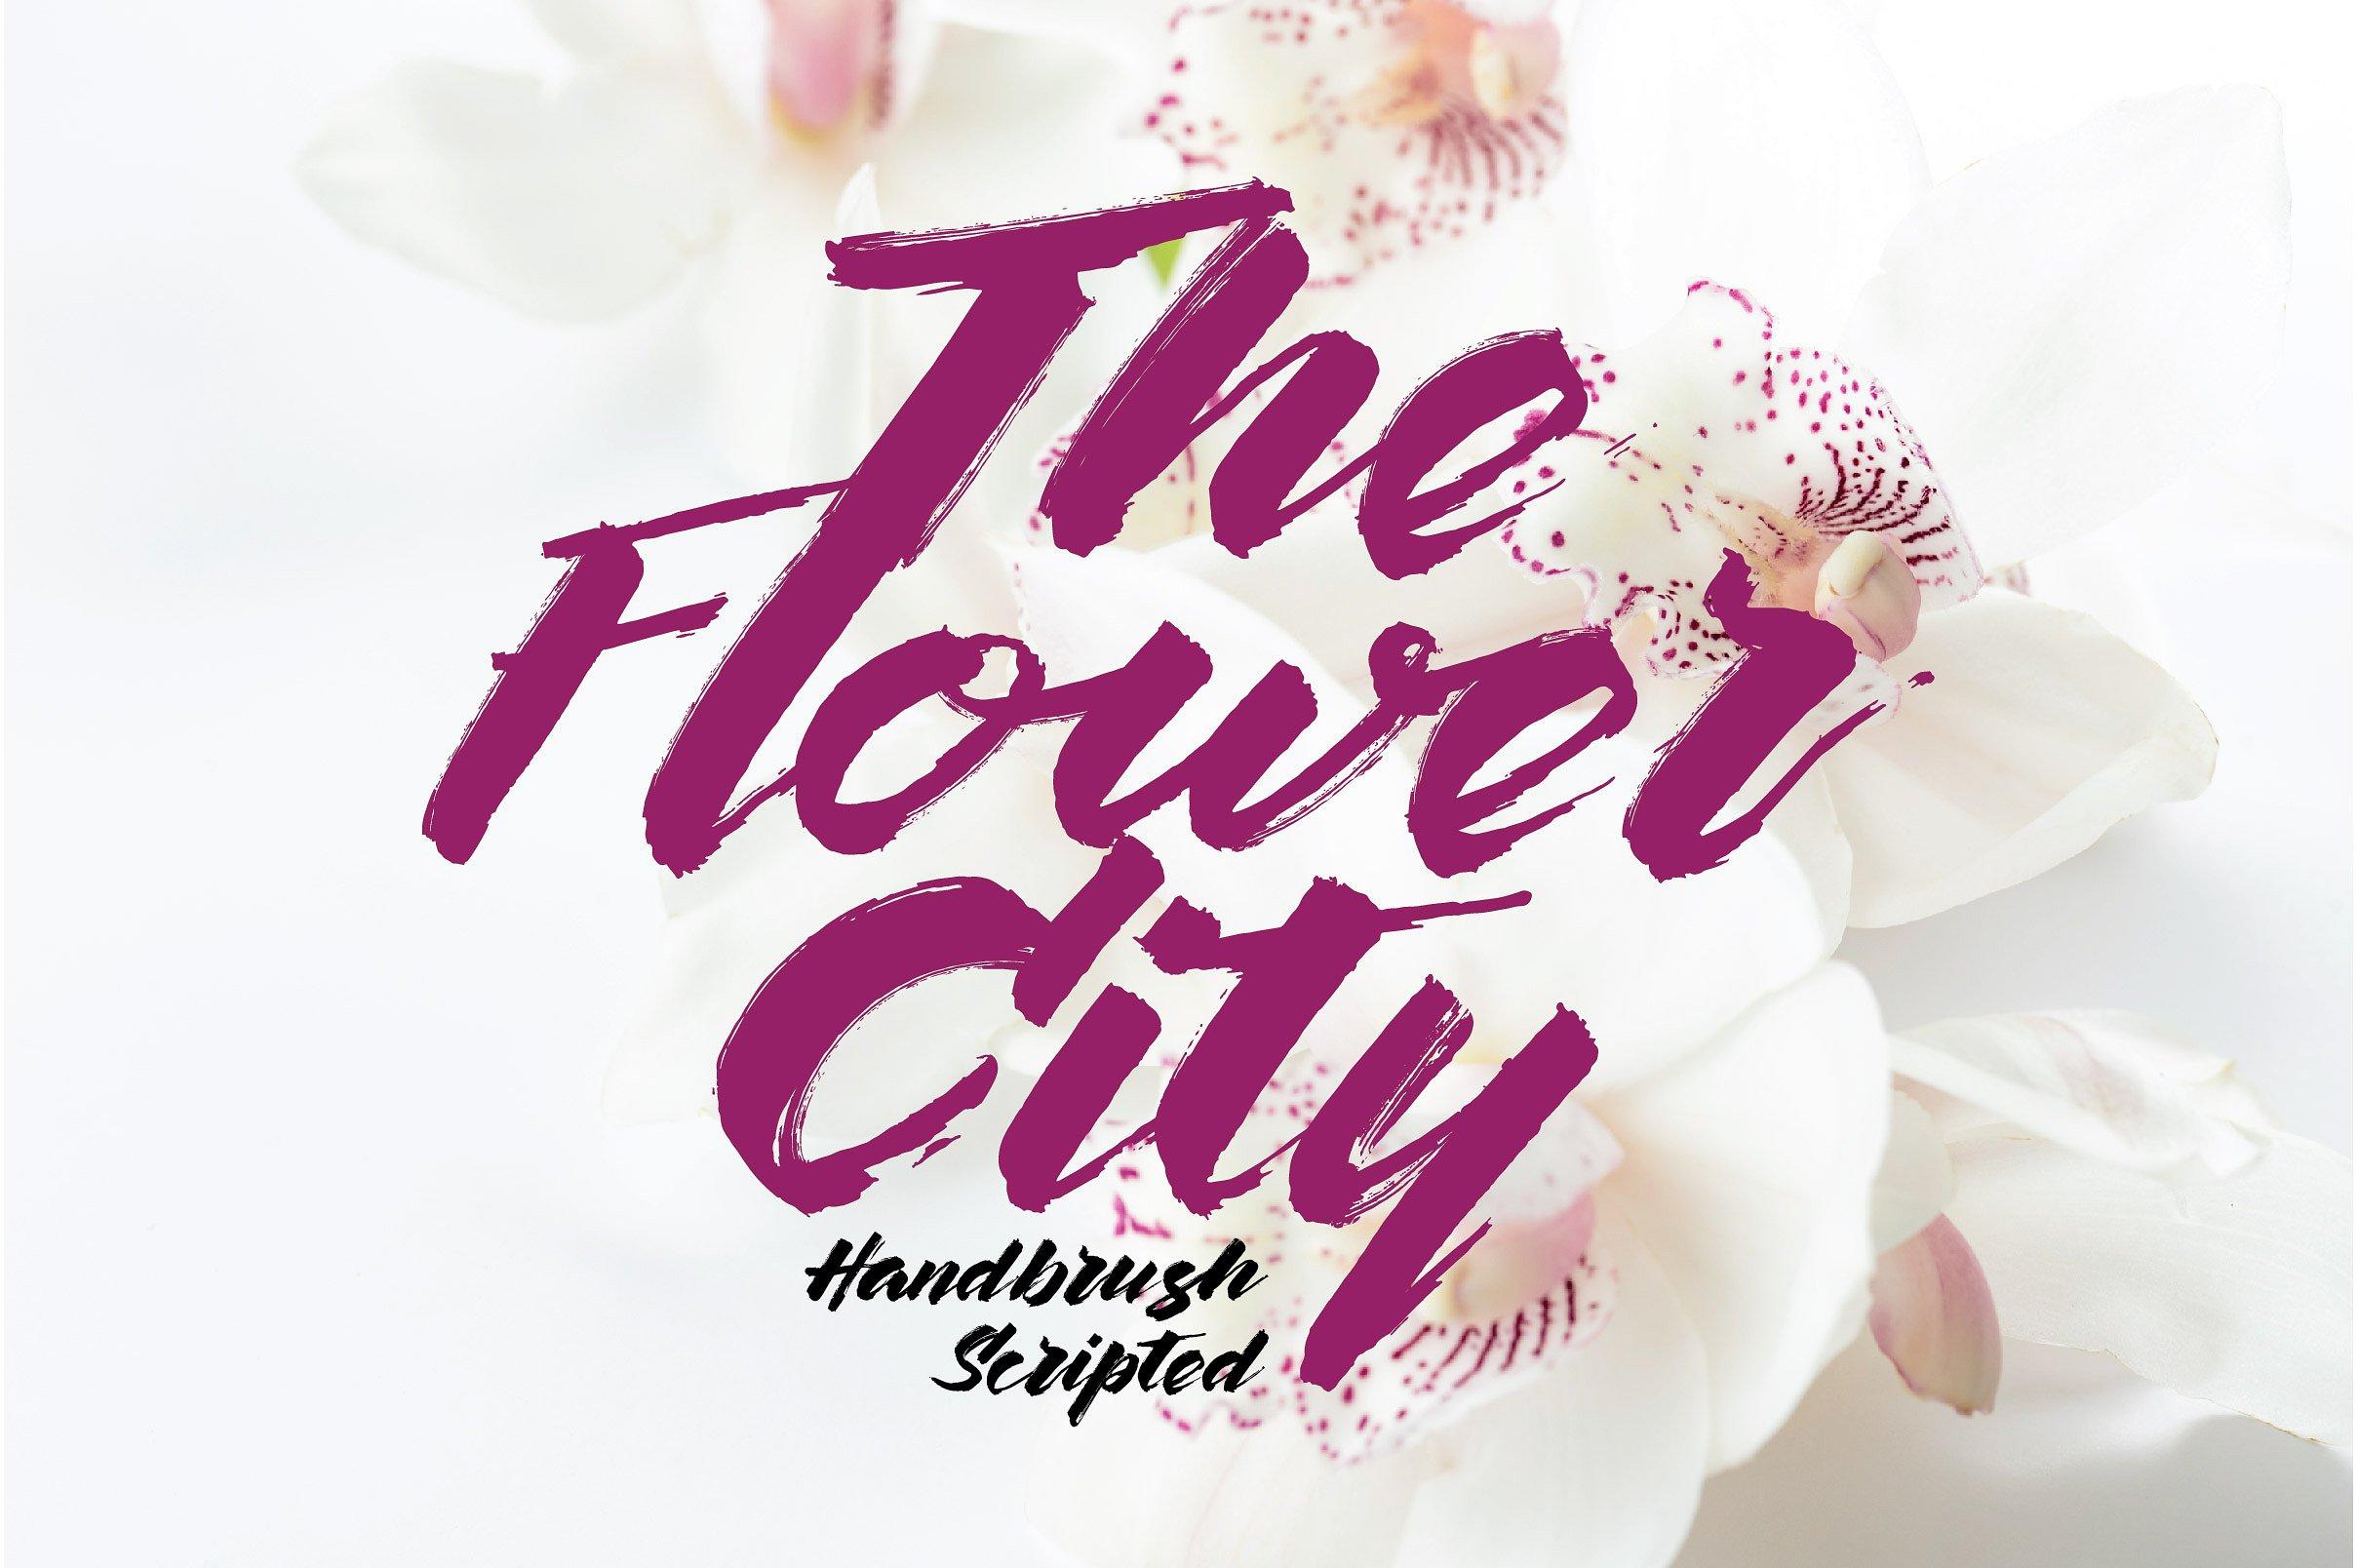 the-flower-city